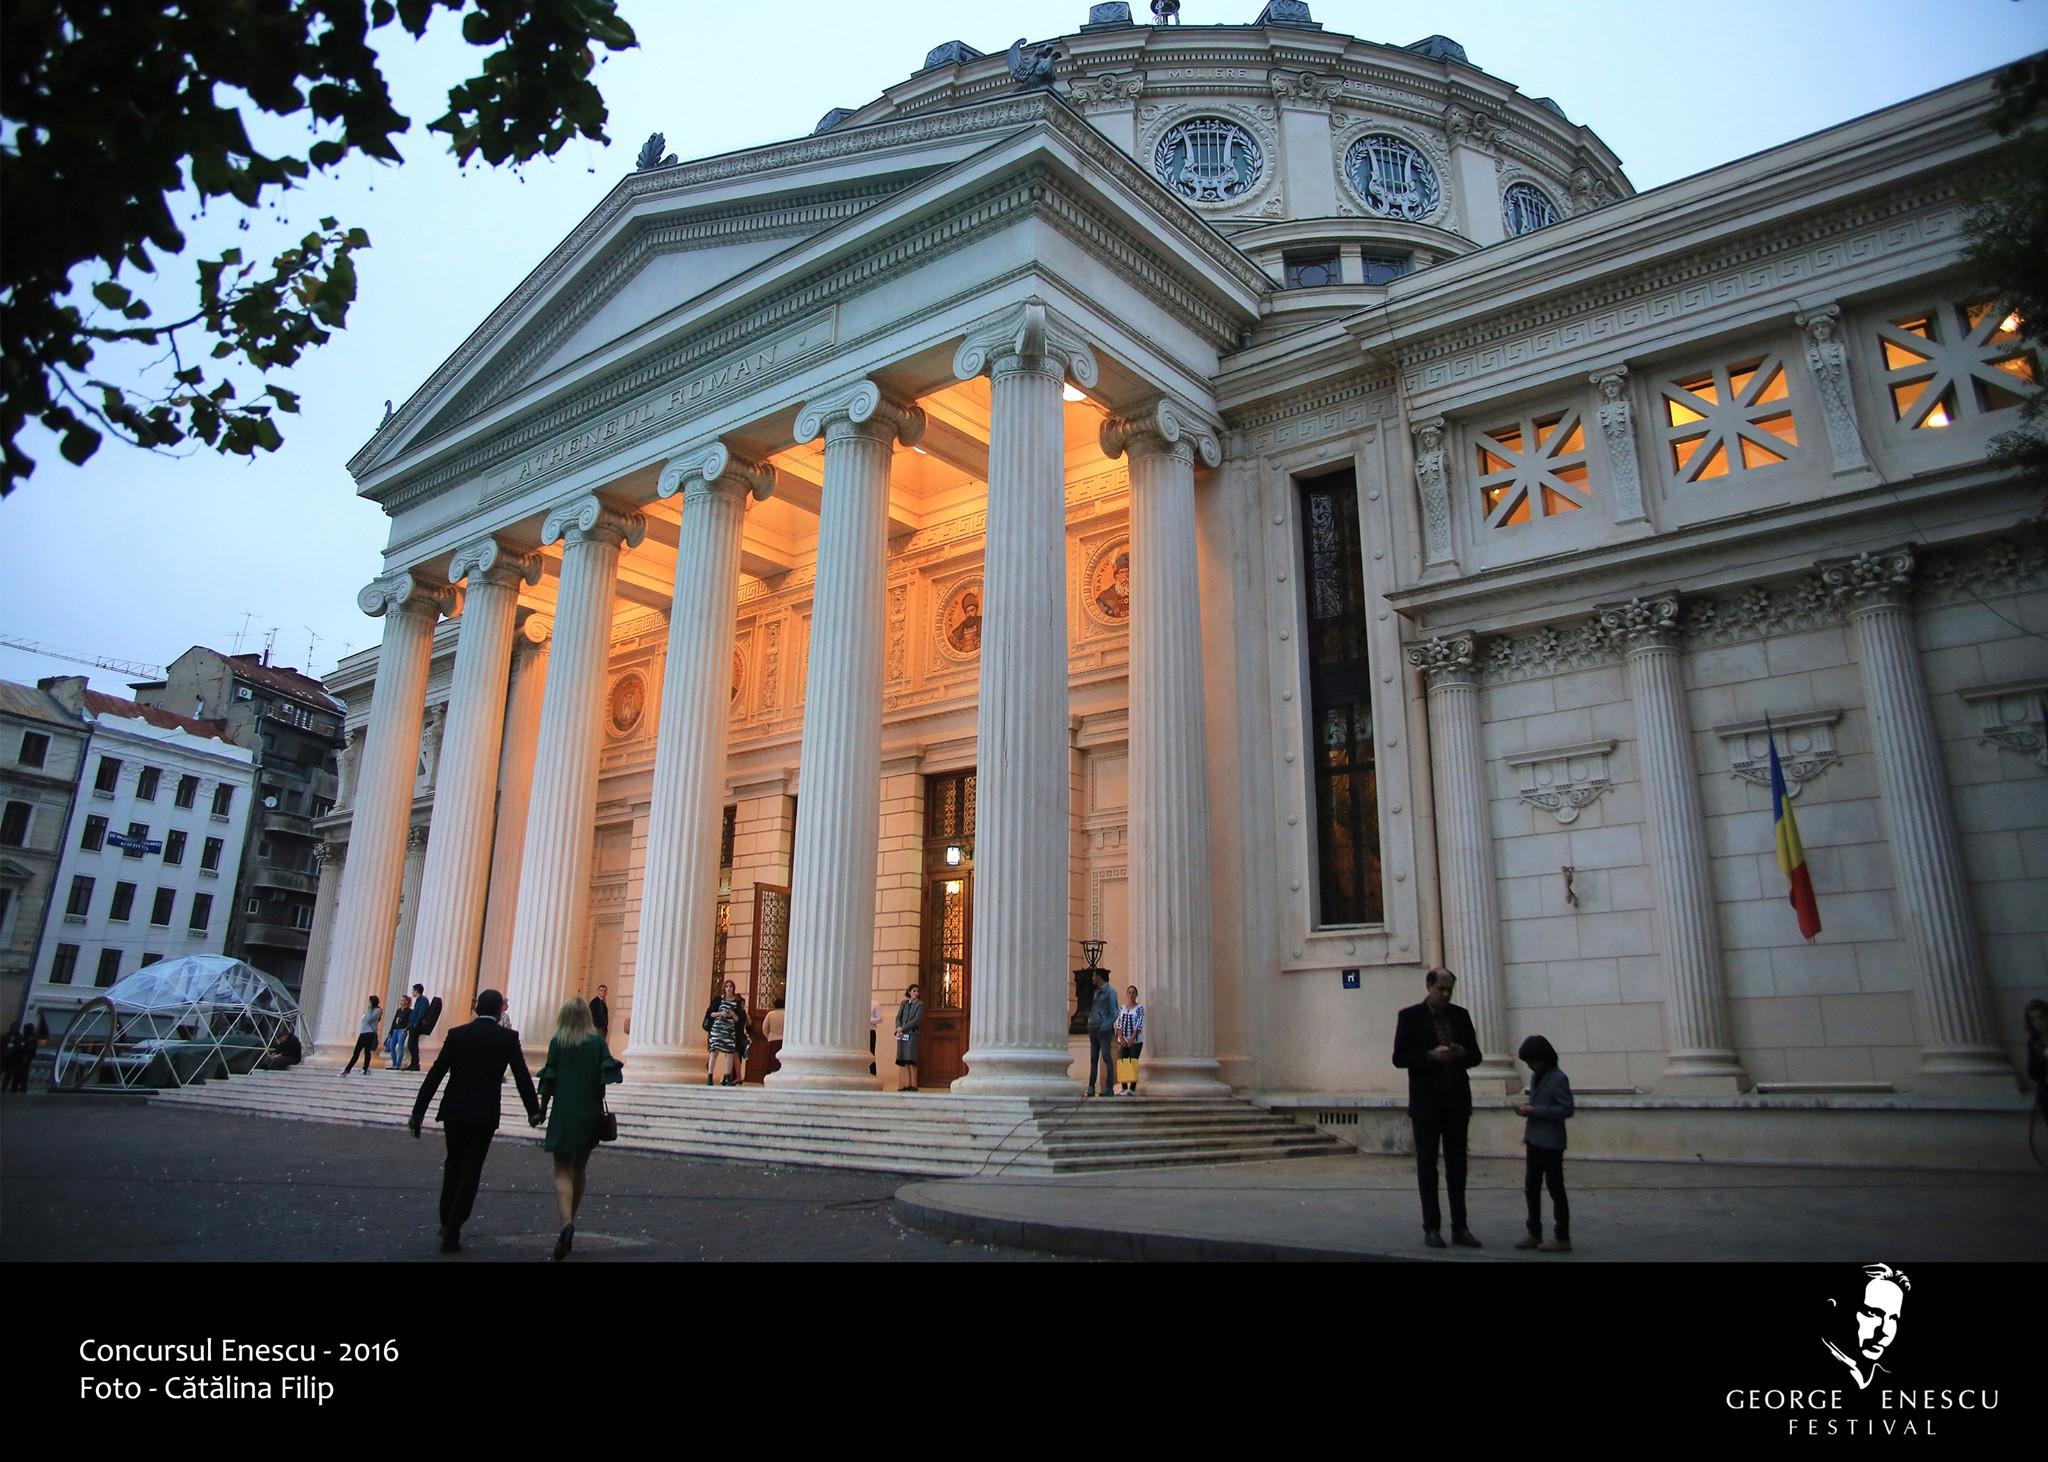 Concurs George Enescu 2020 Manifesto